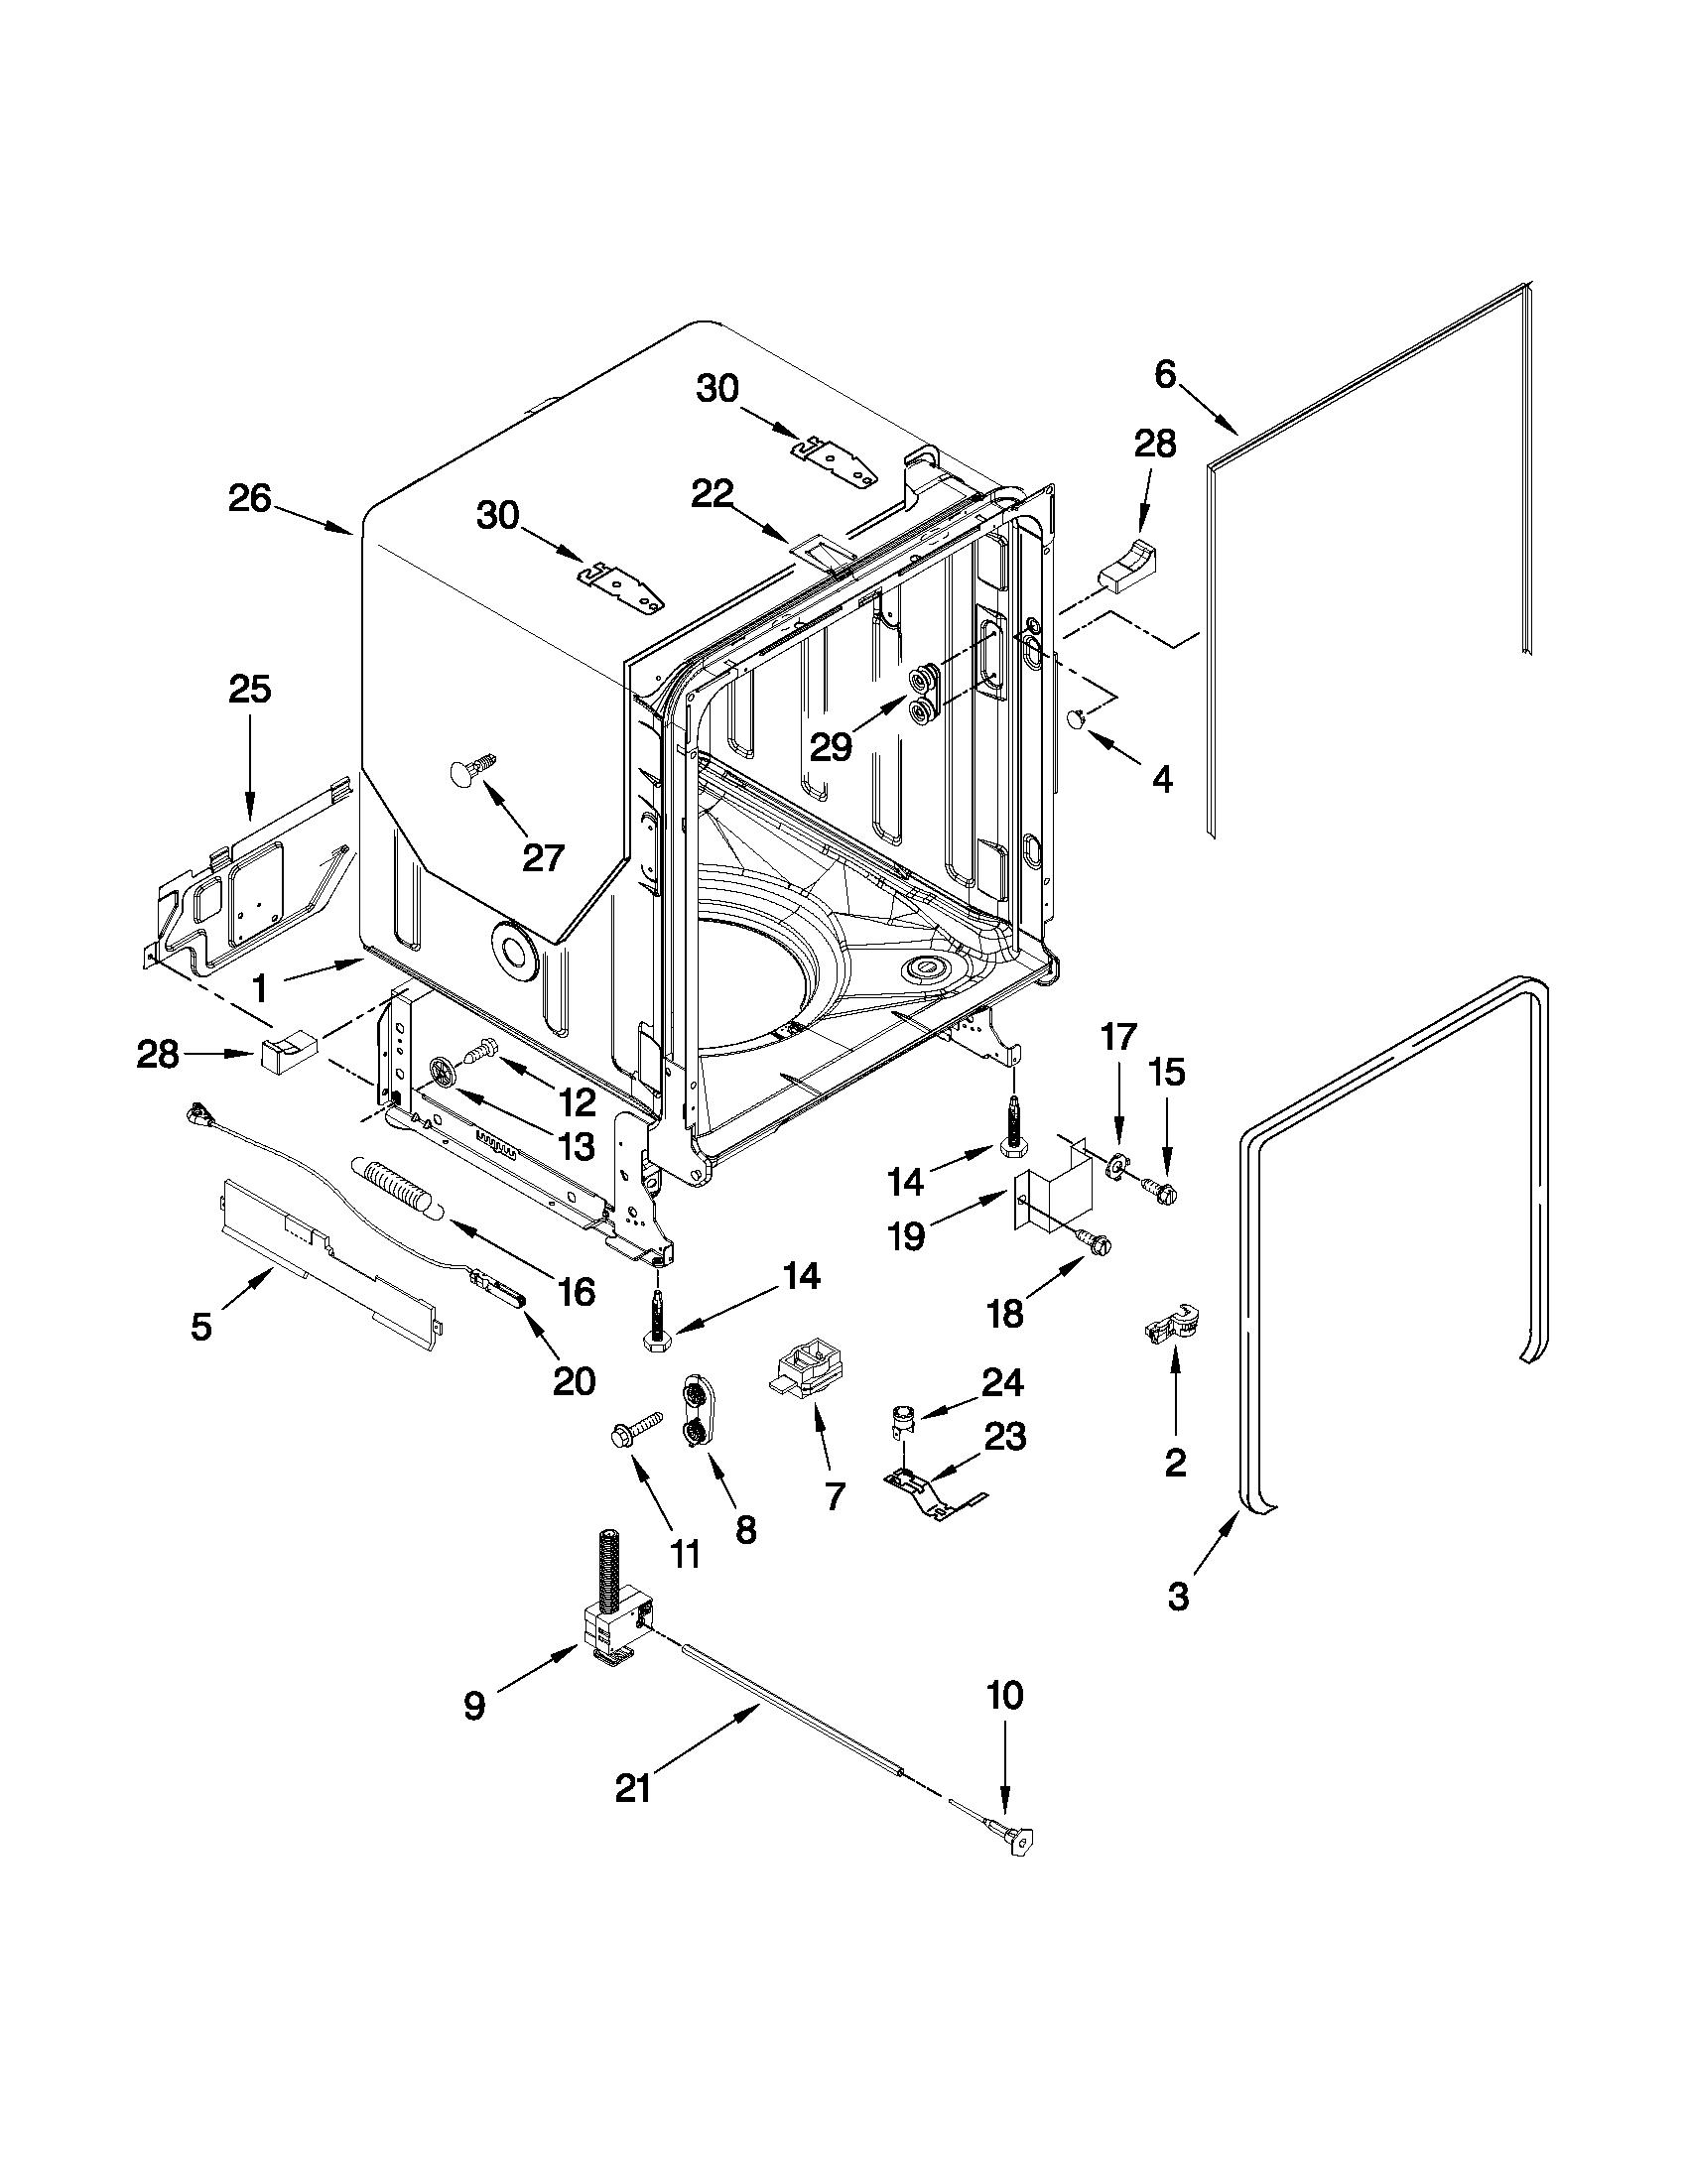 Sears Dishwasher Wiring Diagram Diagrams Frigidaire Schematic P N 665 13969k010 66513593k600 Kenmore Pdf Whirlpool